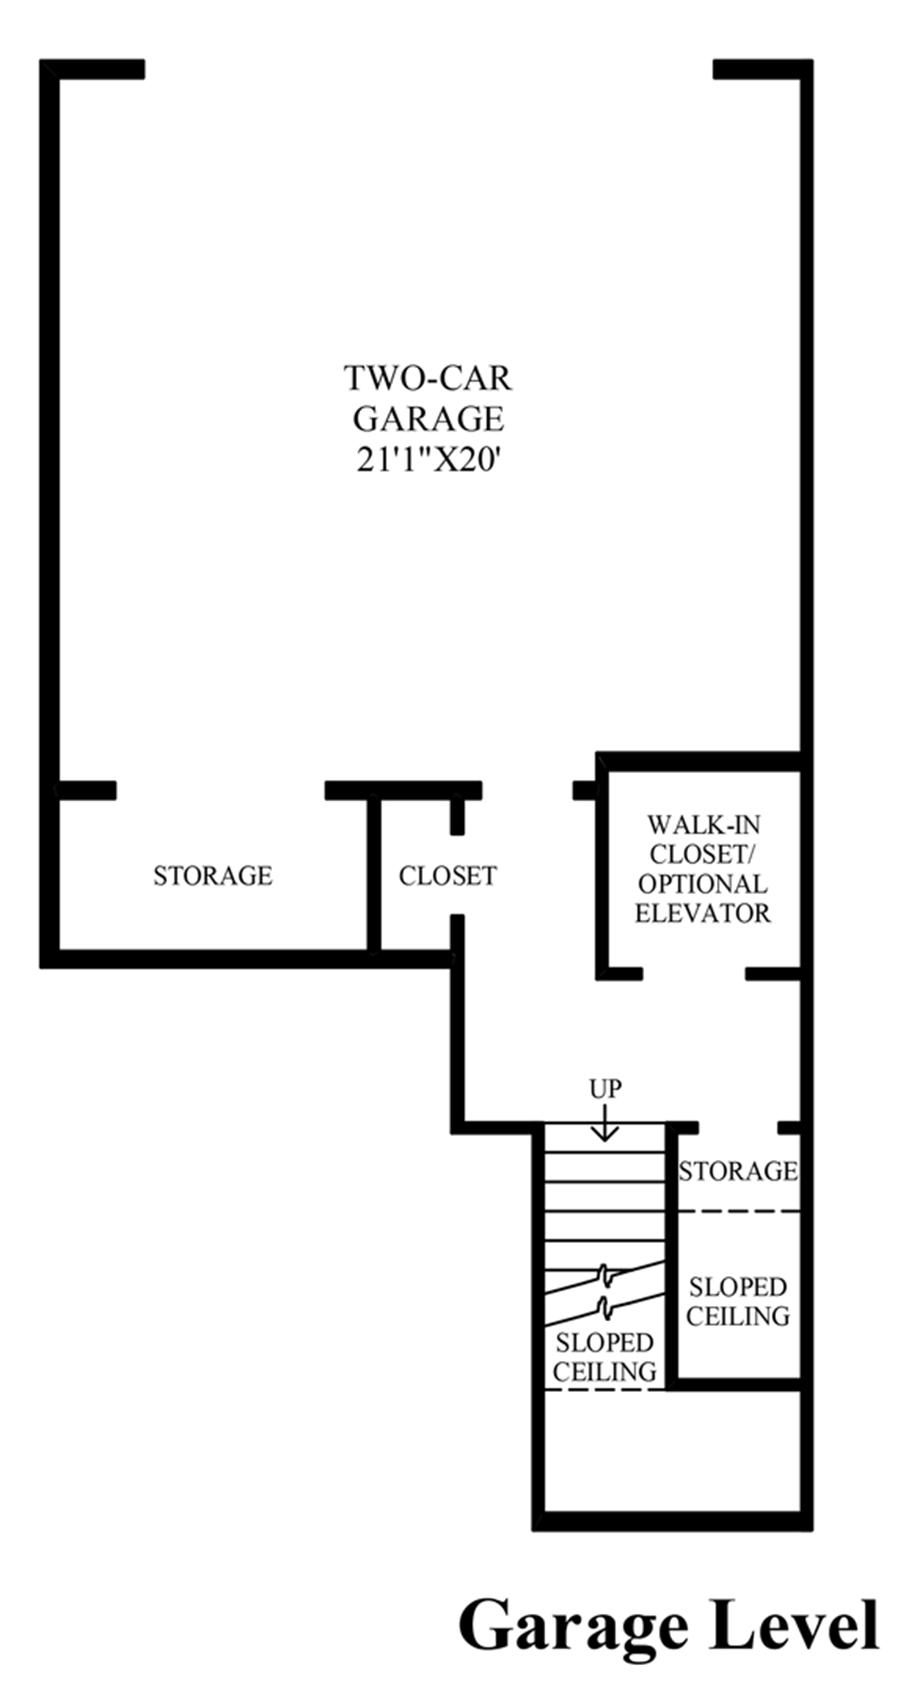 Garage Level Floor Plan